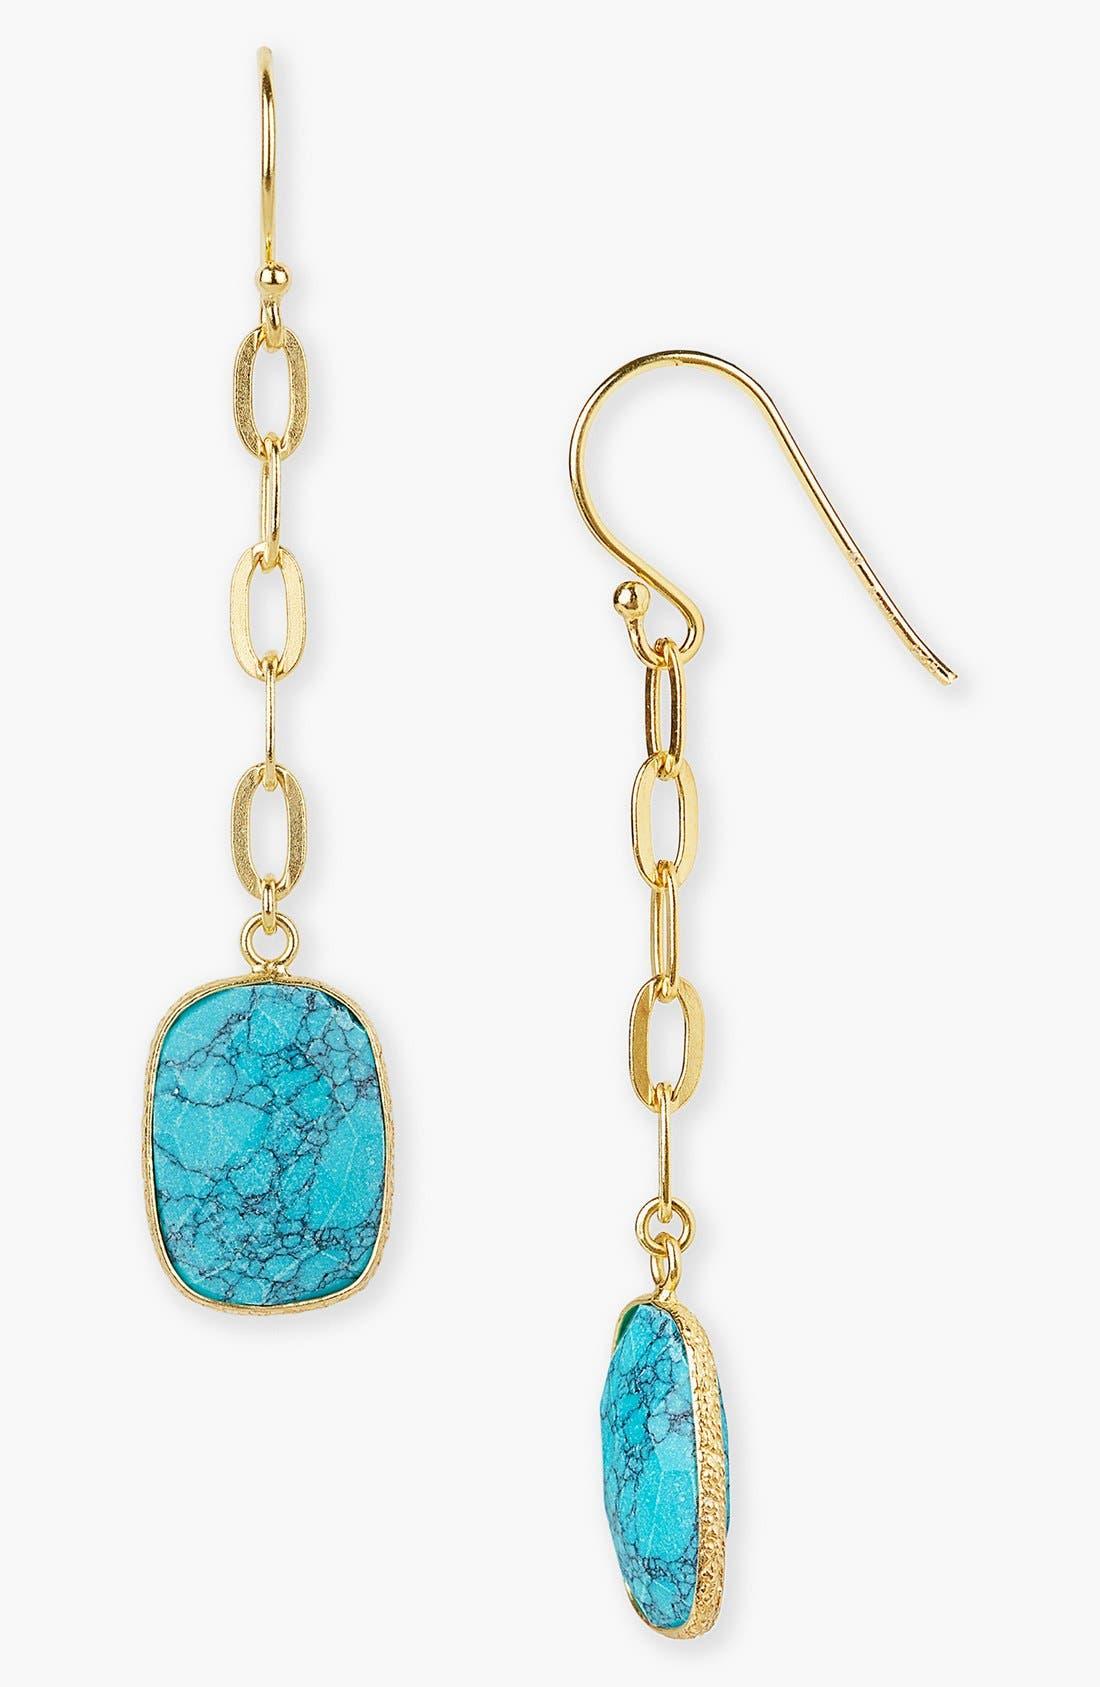 Main Image - Argento Vivo Linear Turquoise Drop Earrings